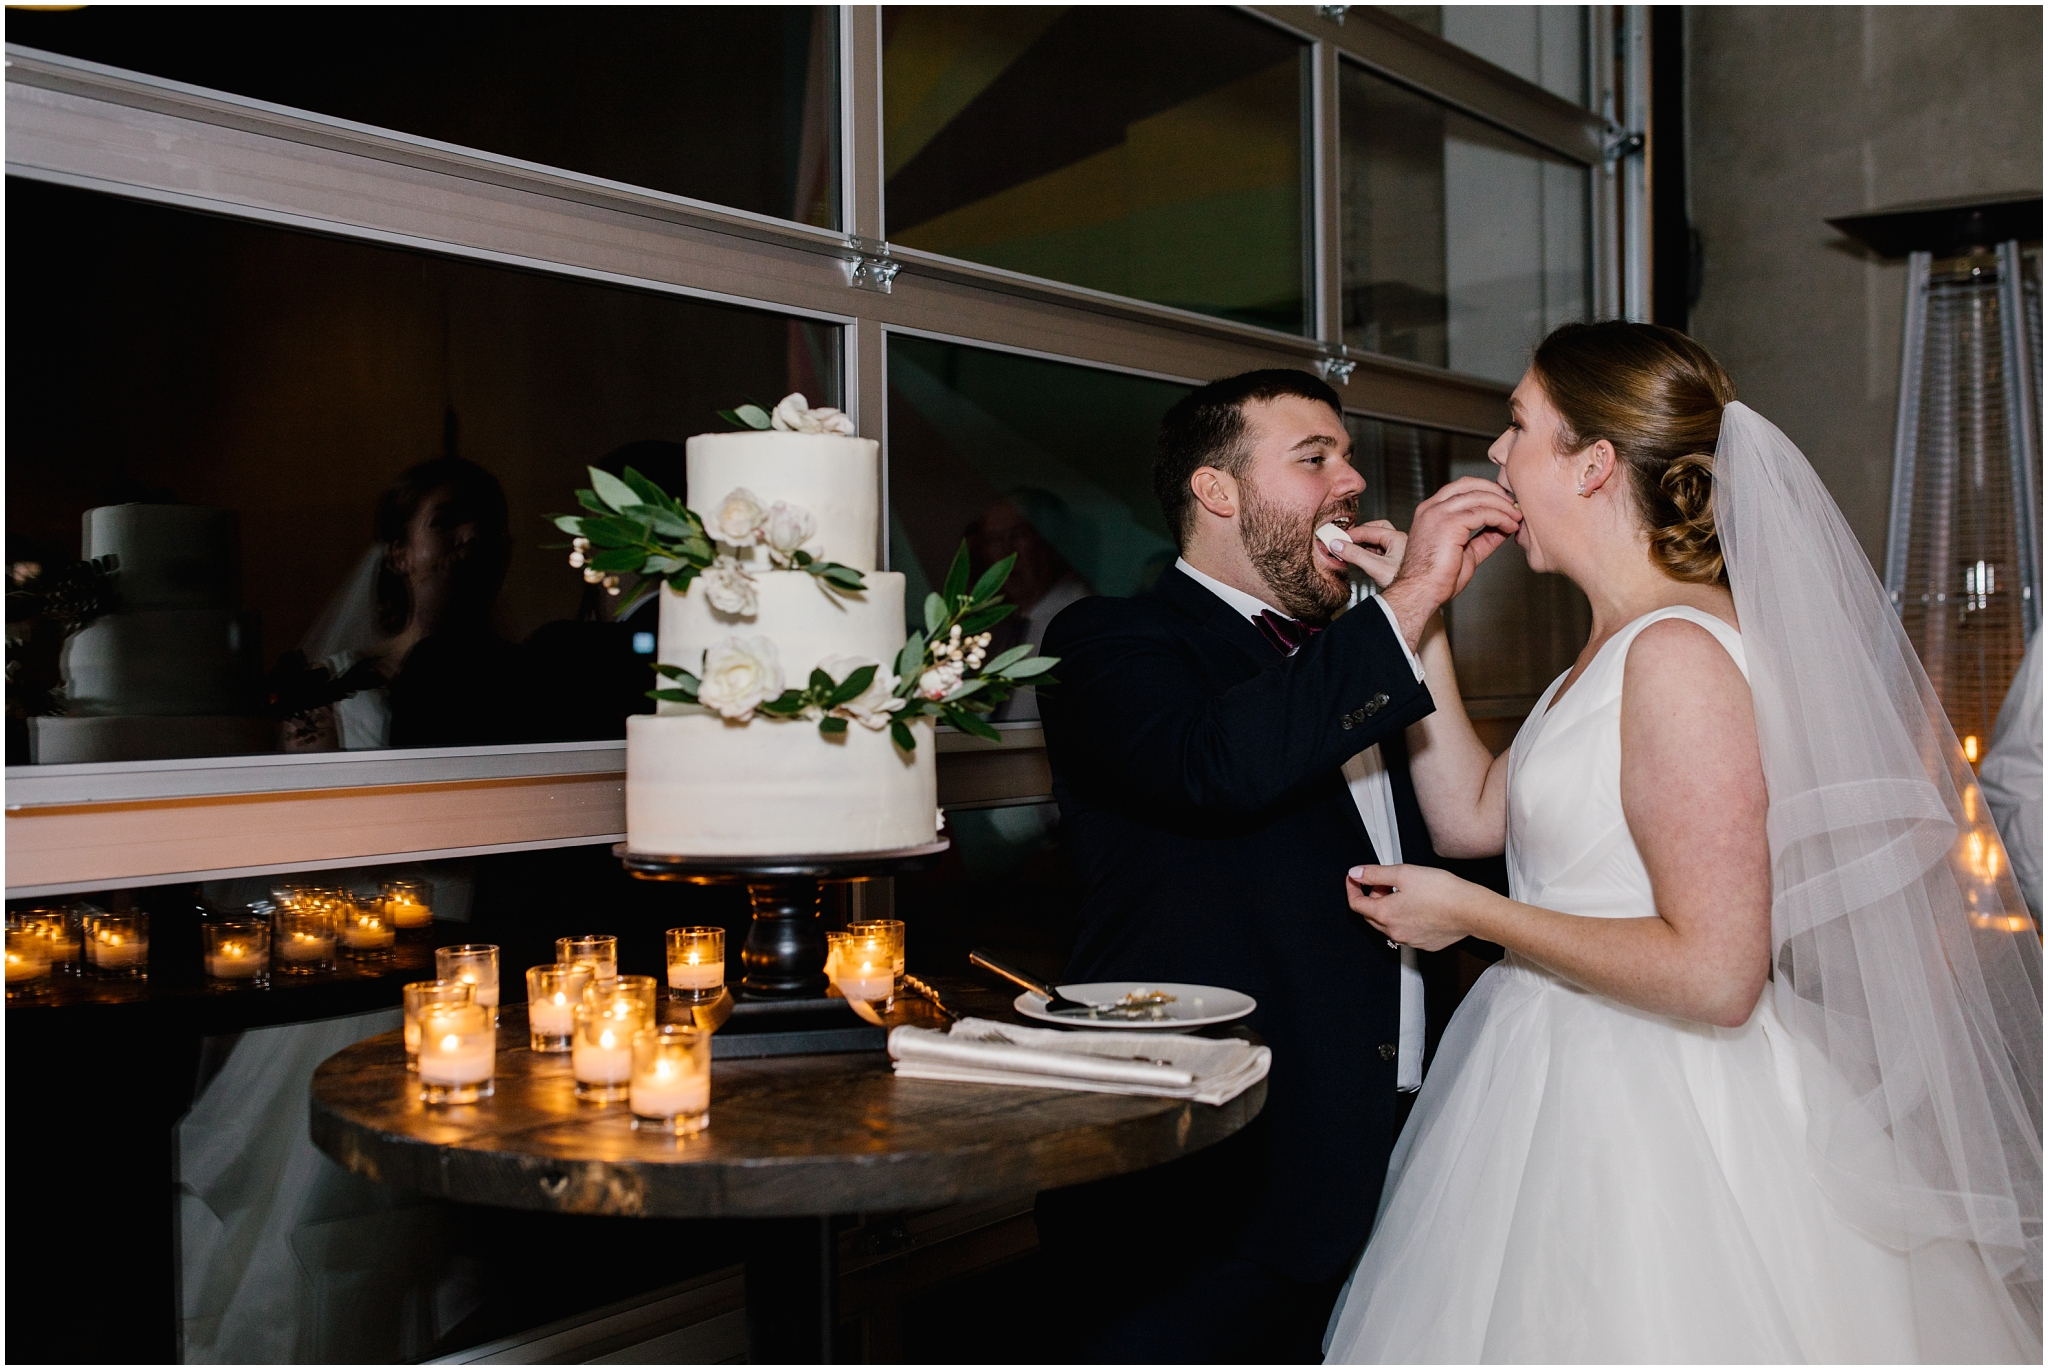 CN-Wedding-450_Lizzie-B-Imagery-Utah-Wedding-Photographer-Blessed-Sacrament-Catholic-Church-Sandy-Utah-The-Blended-Table-Salt-Lake-City.jpg